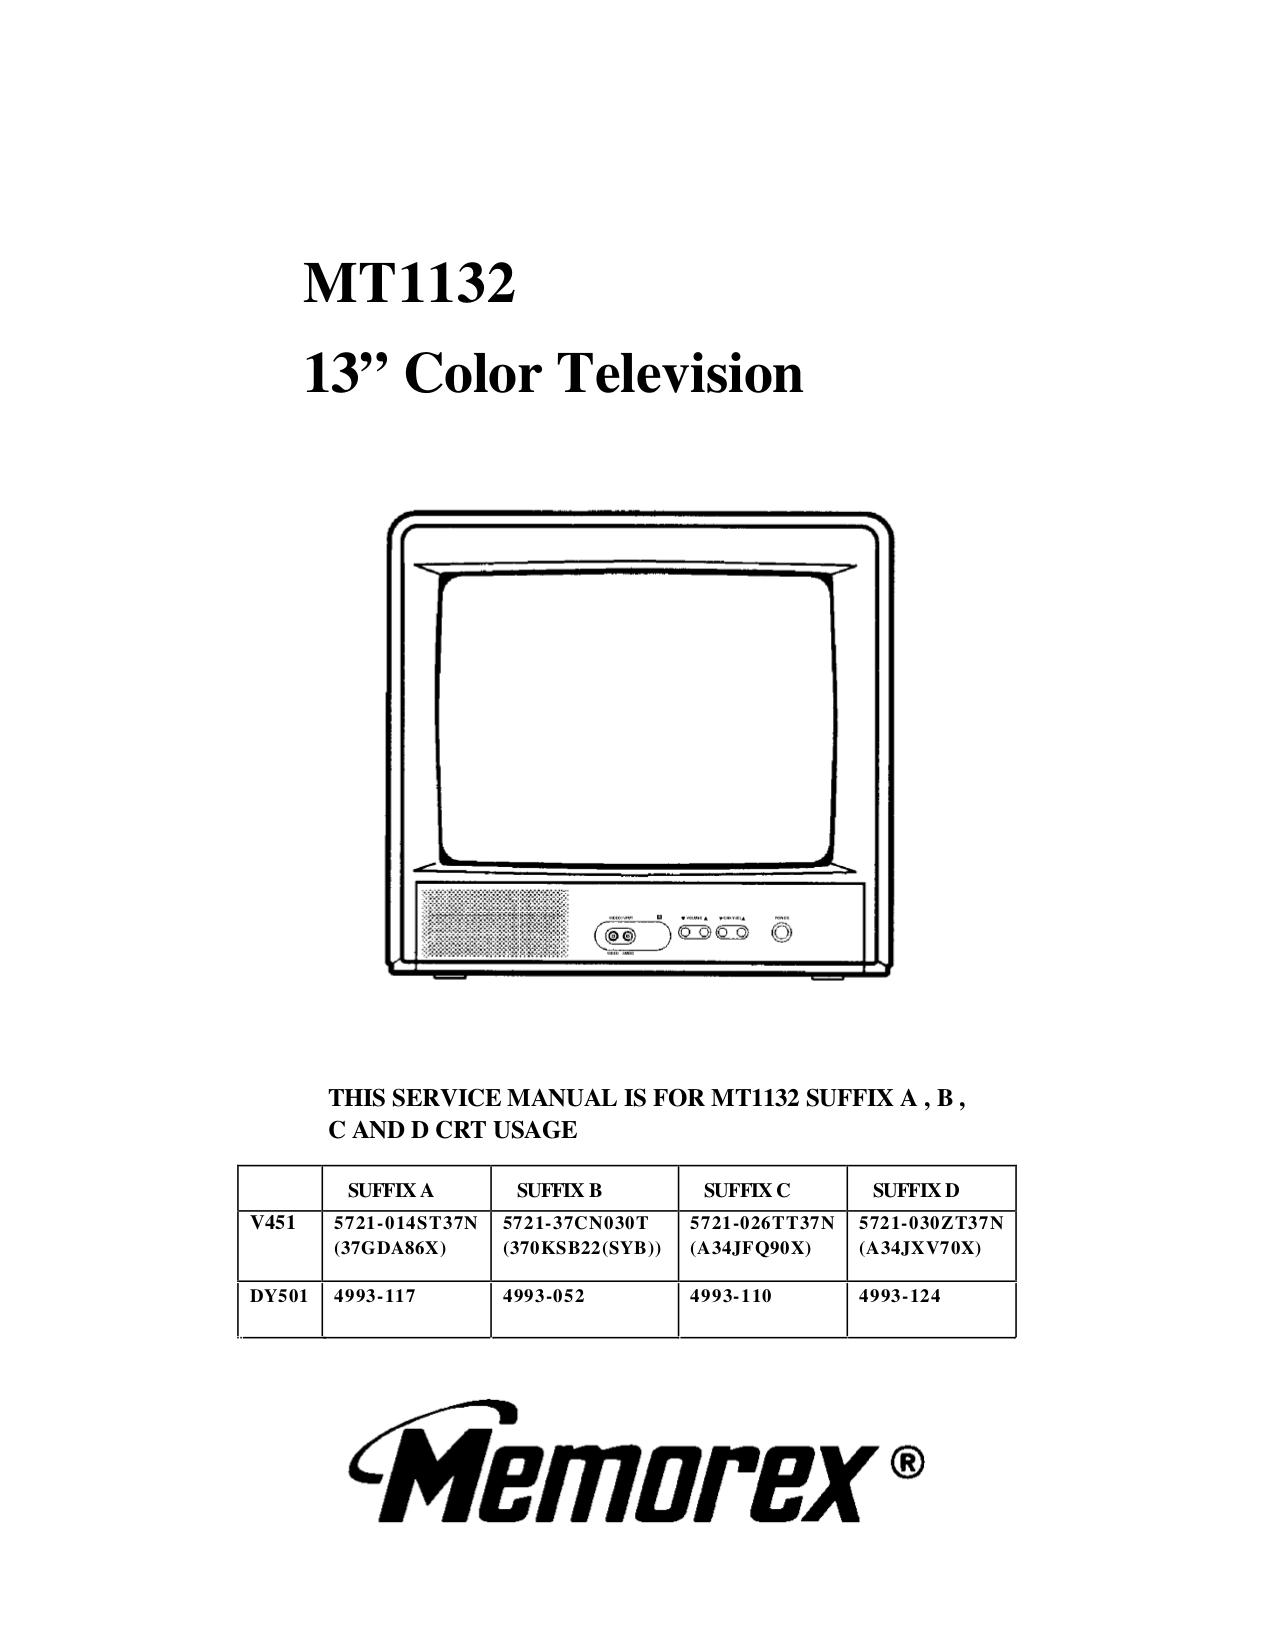 download free pdf for memorex mt1132a tv manual